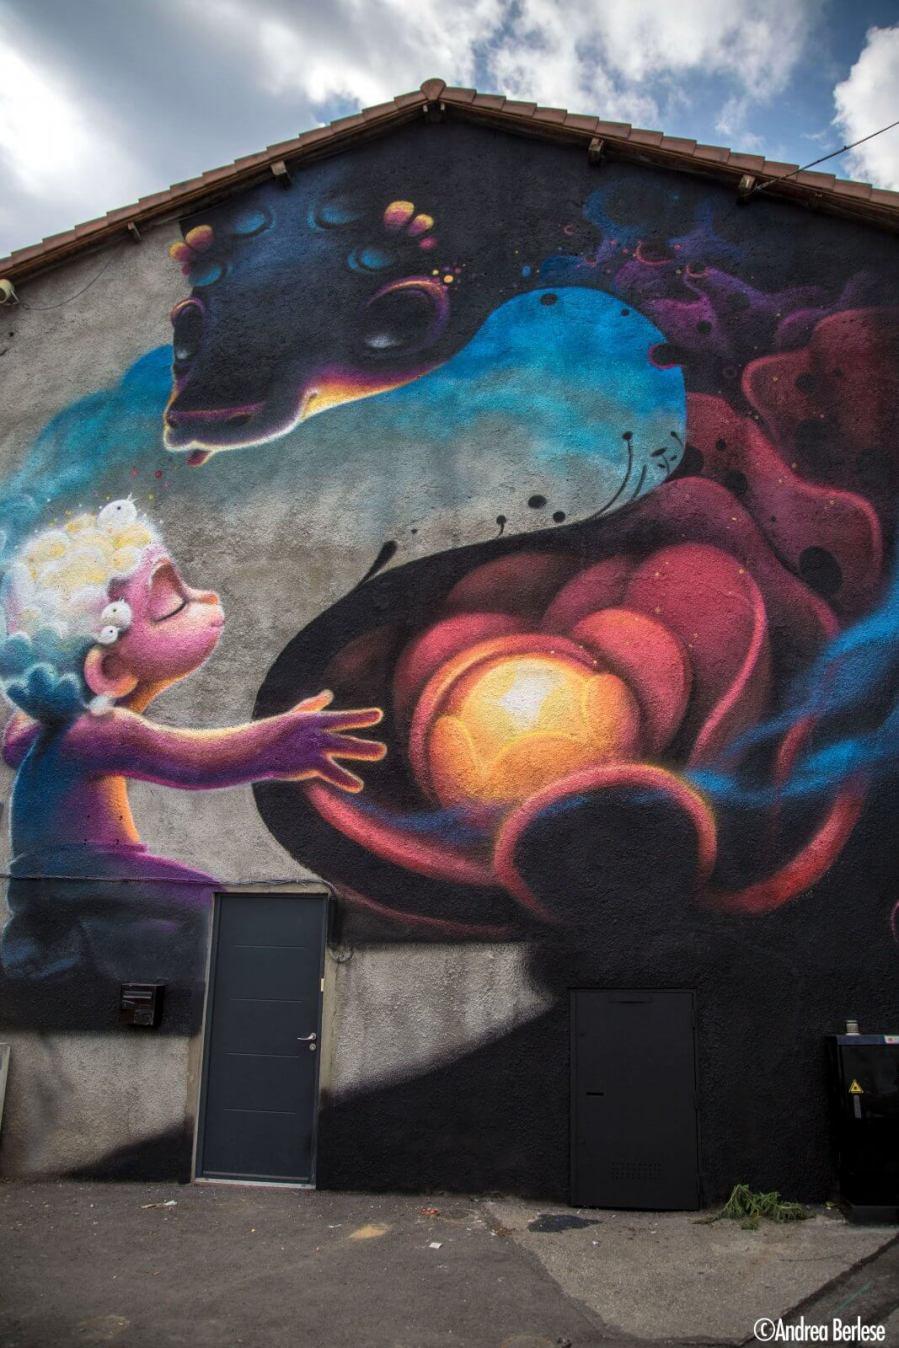 Grenoble-Street-Art-Festival-Animalitoland-place-du-8-mai-1945-Pont-de-Claix